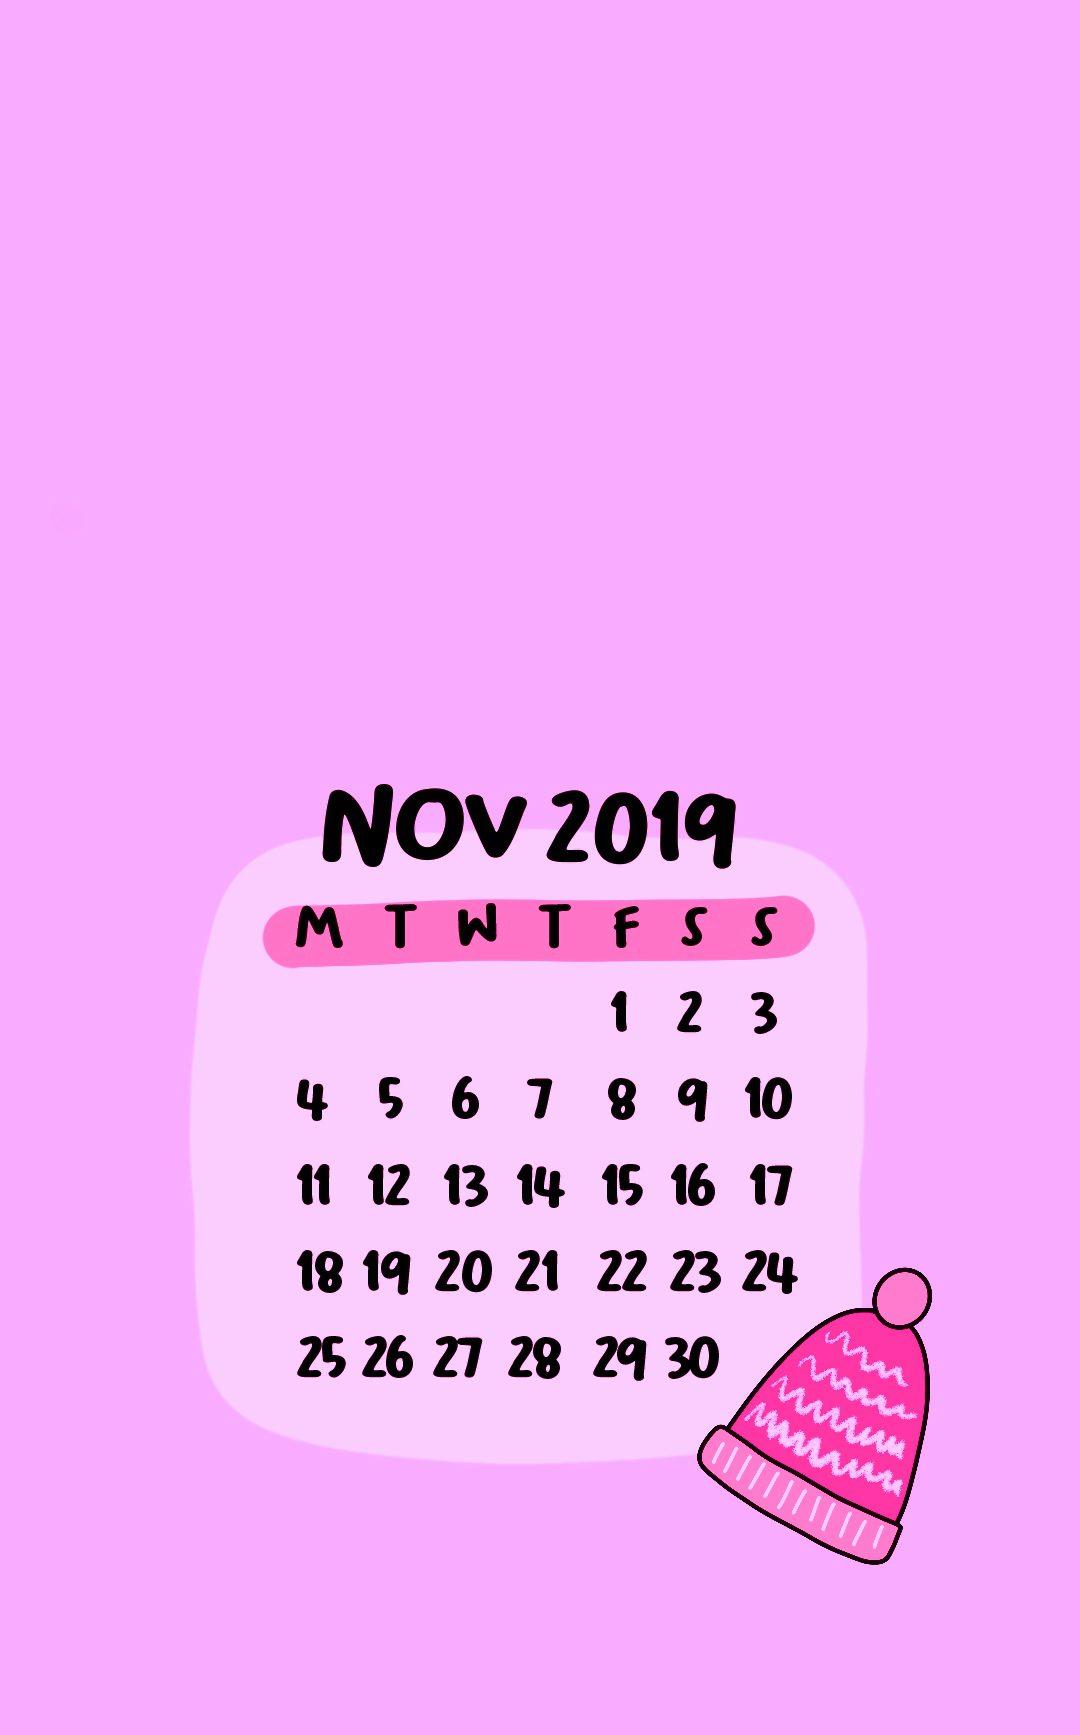 November 2019 iPhone Calendar